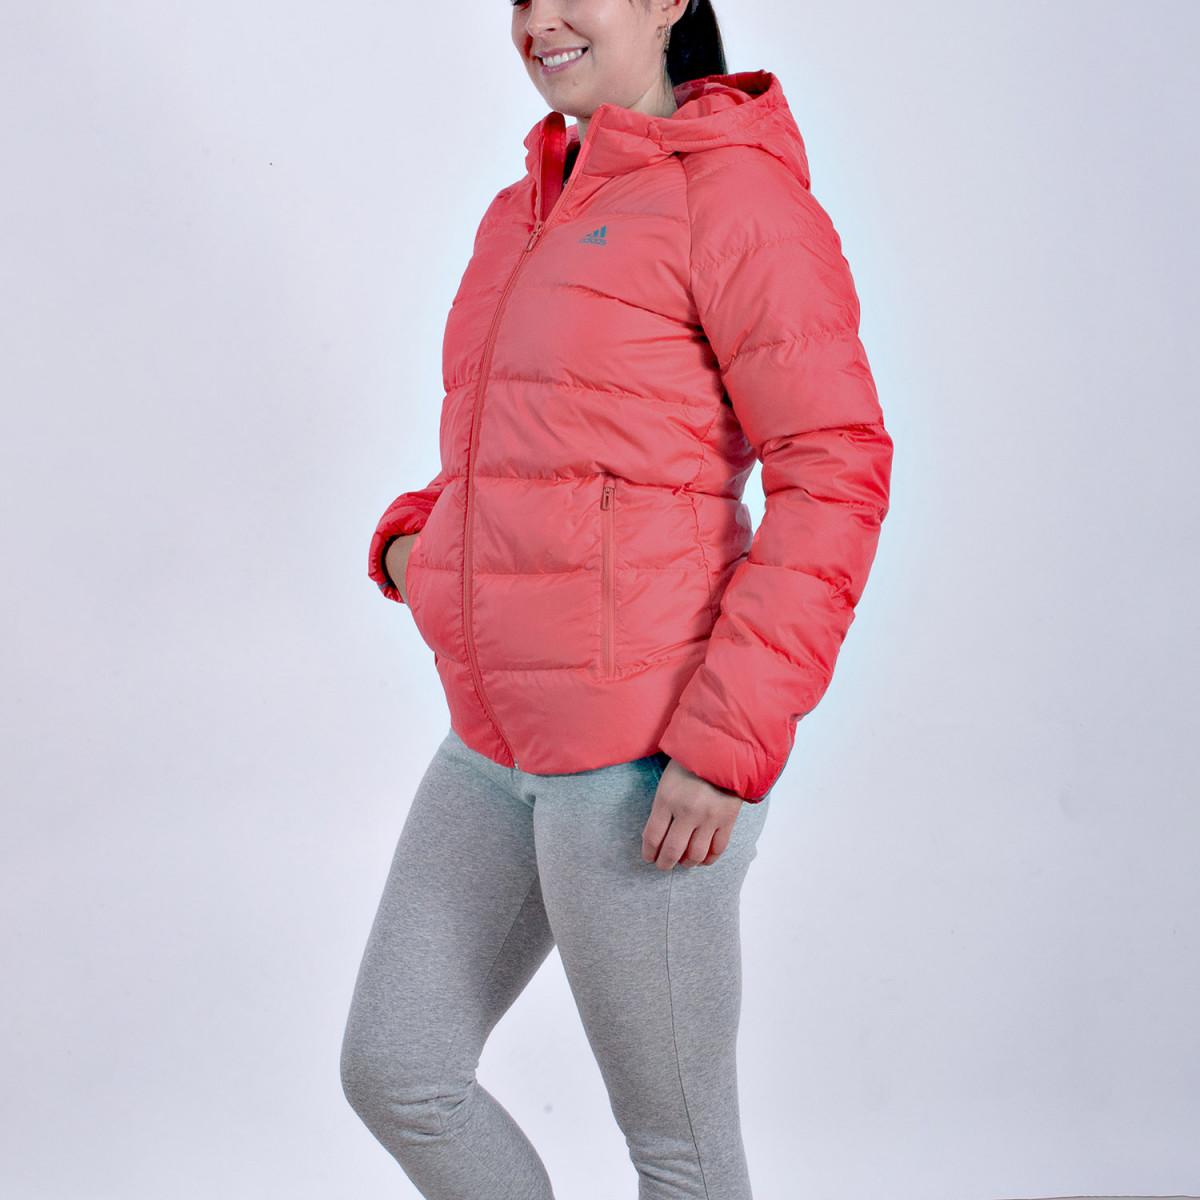 3d79cd6c5eb03 Adidas Urban Campera Chita Superstar W